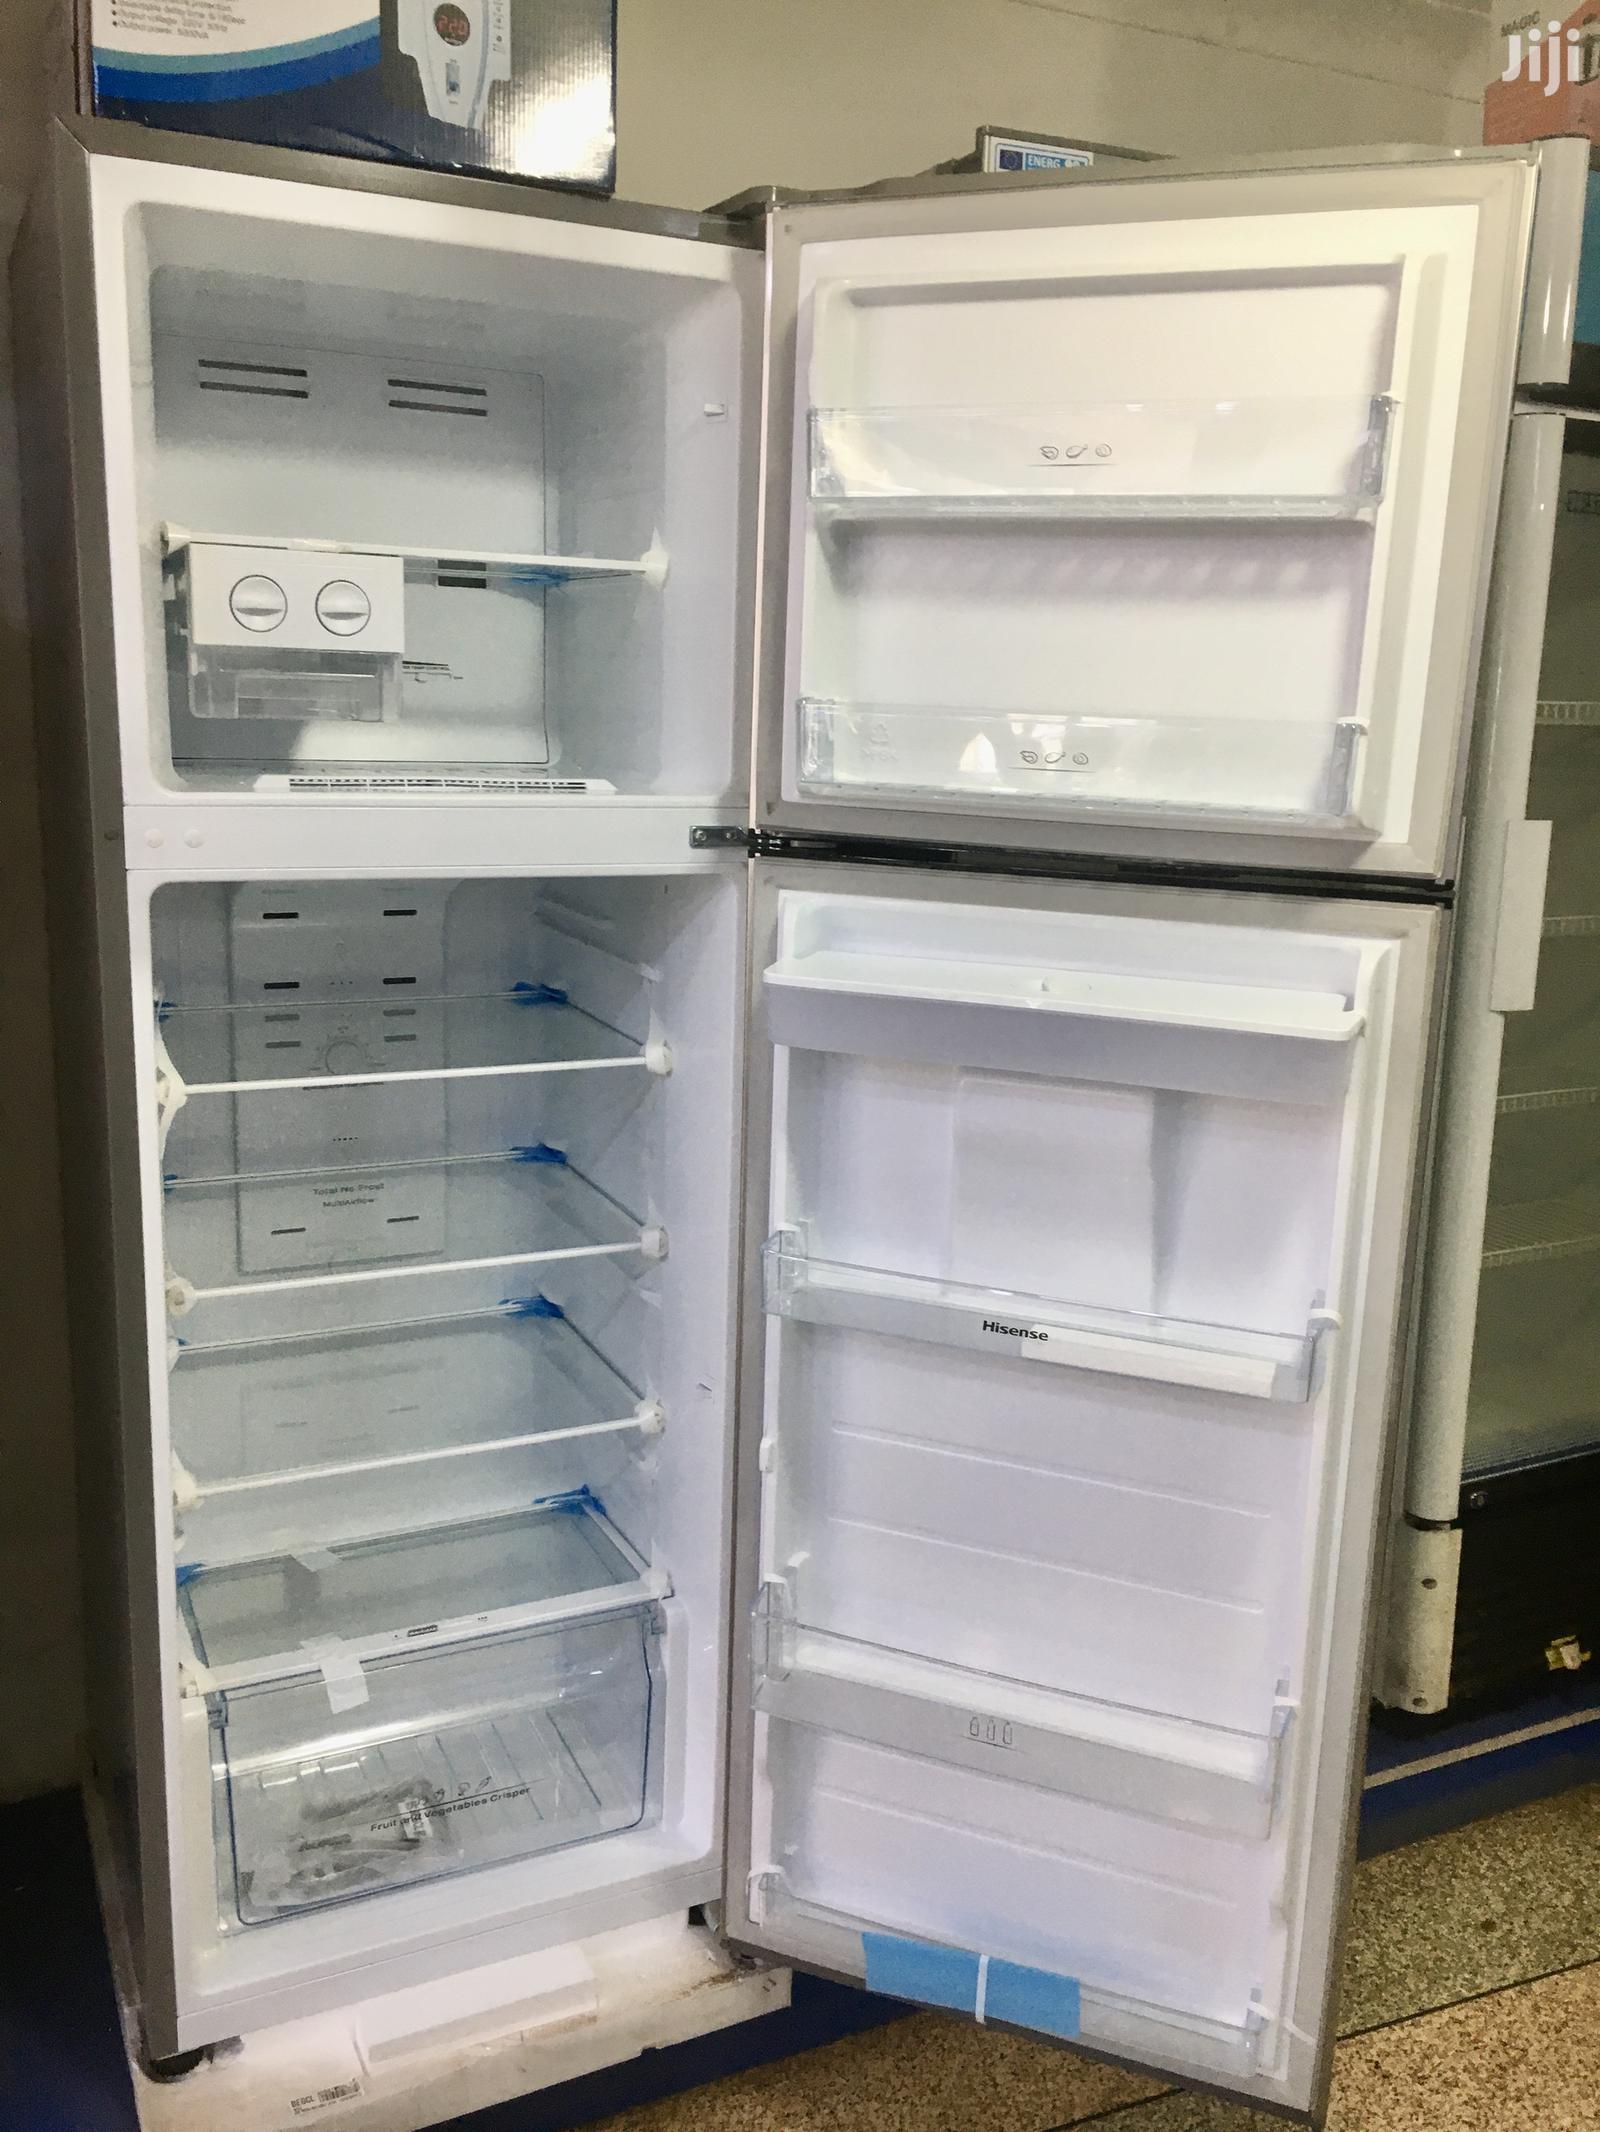 Hisense 419 Litres Refridgerator Frost Free With Dispenser   Kitchen Appliances for sale in Kampala, Central Region, Uganda